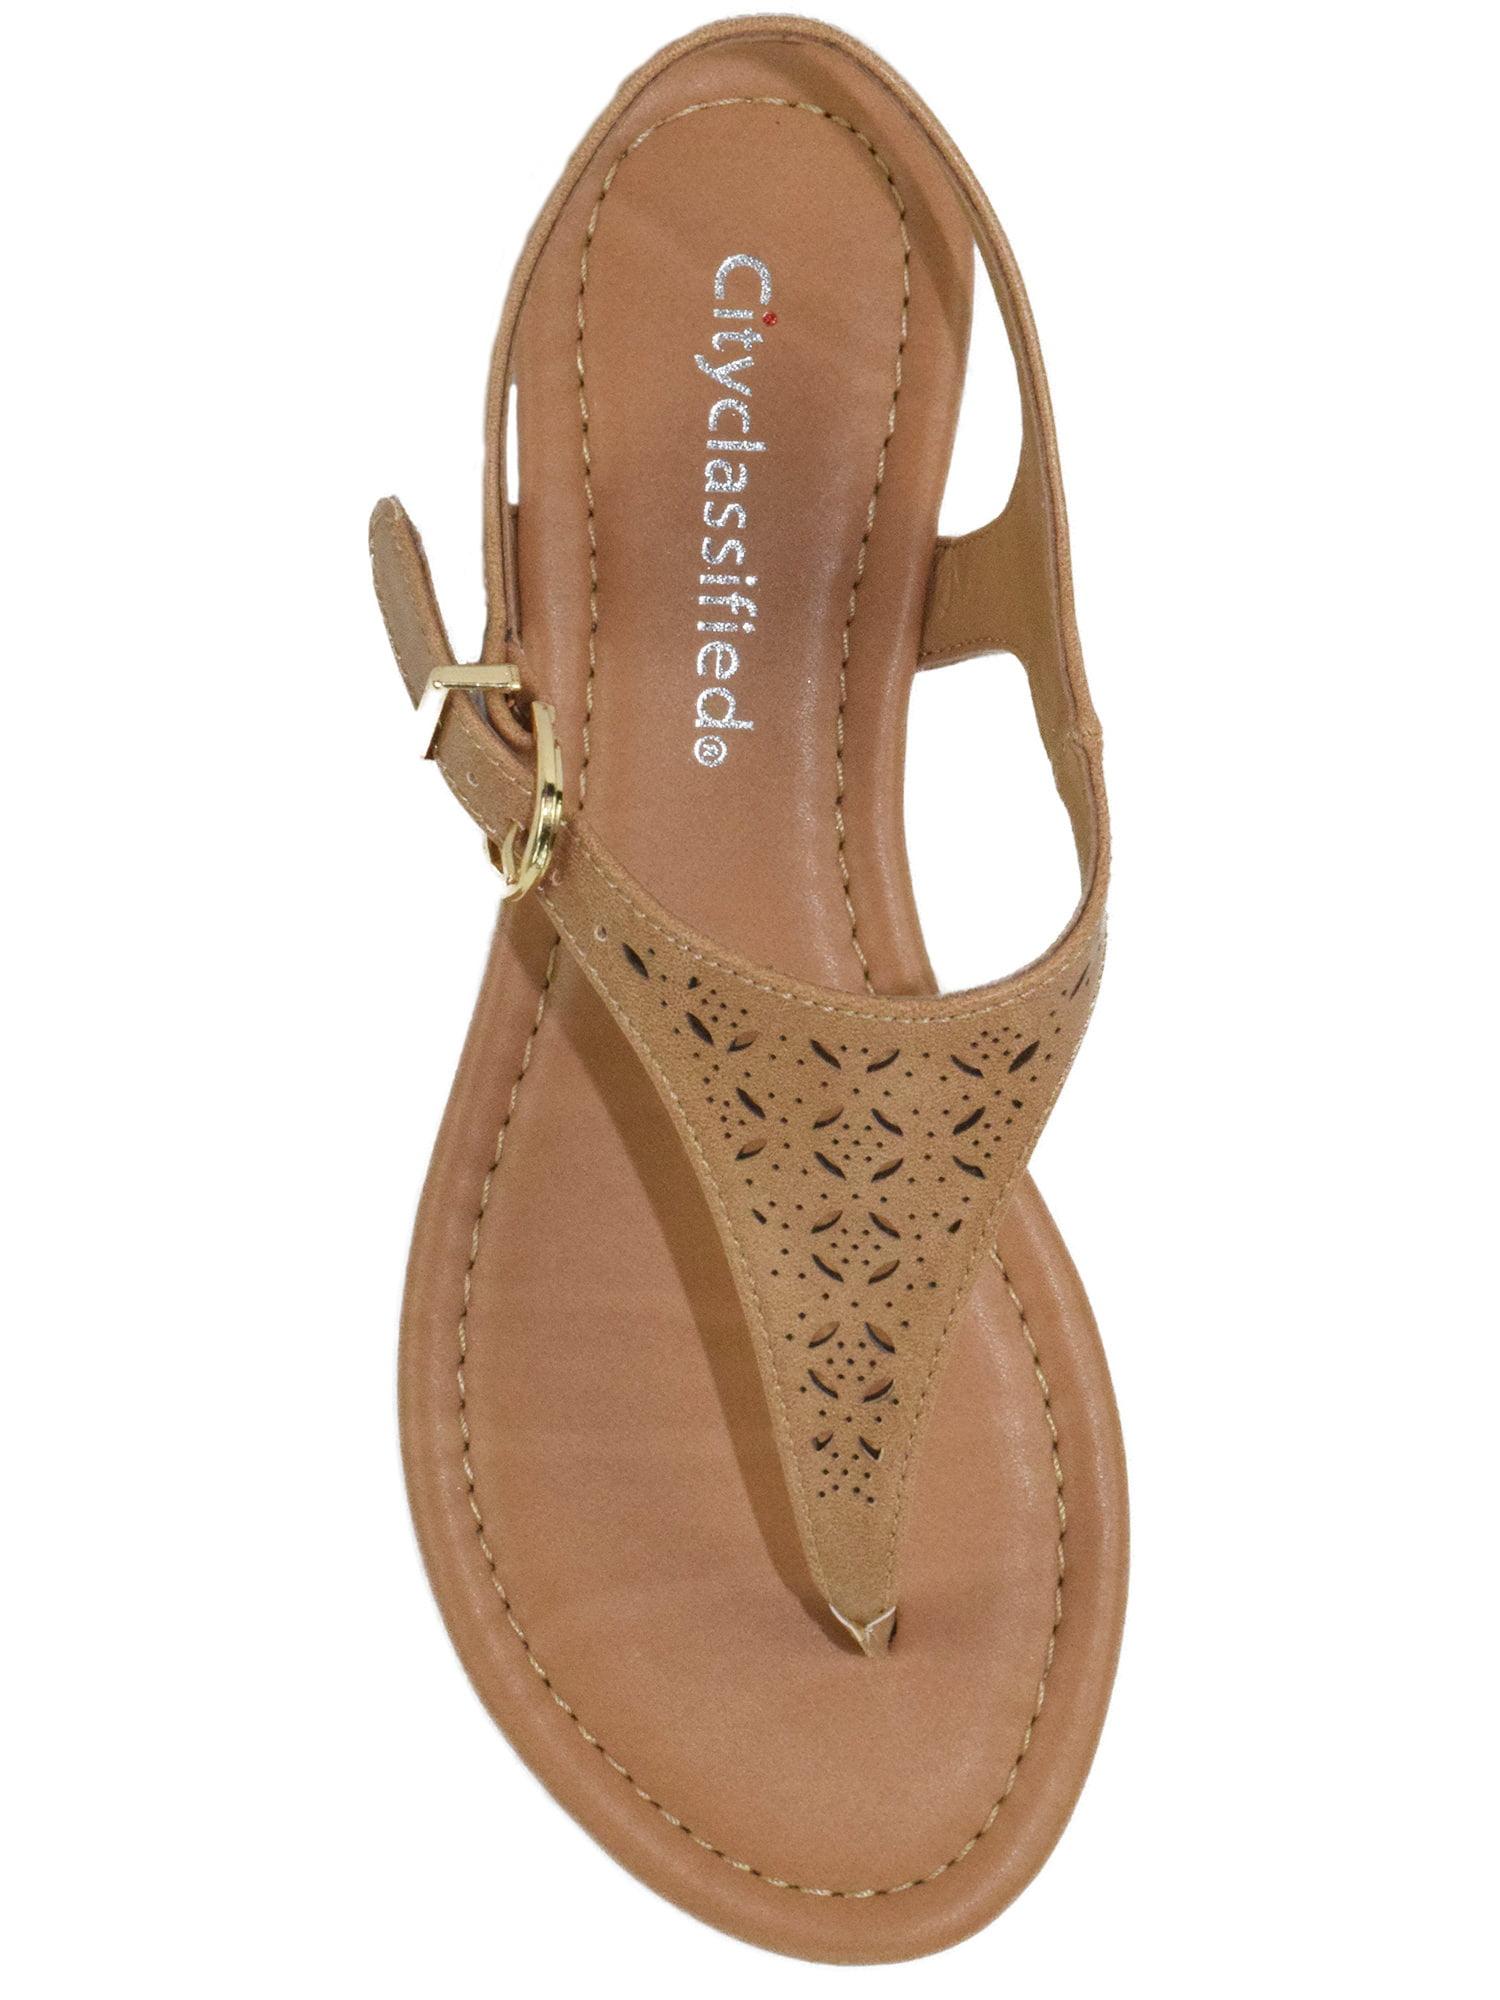 T-STRAP Sandals CASUAL Shoes Thong Flops Flip Flat Slipper SUMMER COMFORT Artesi